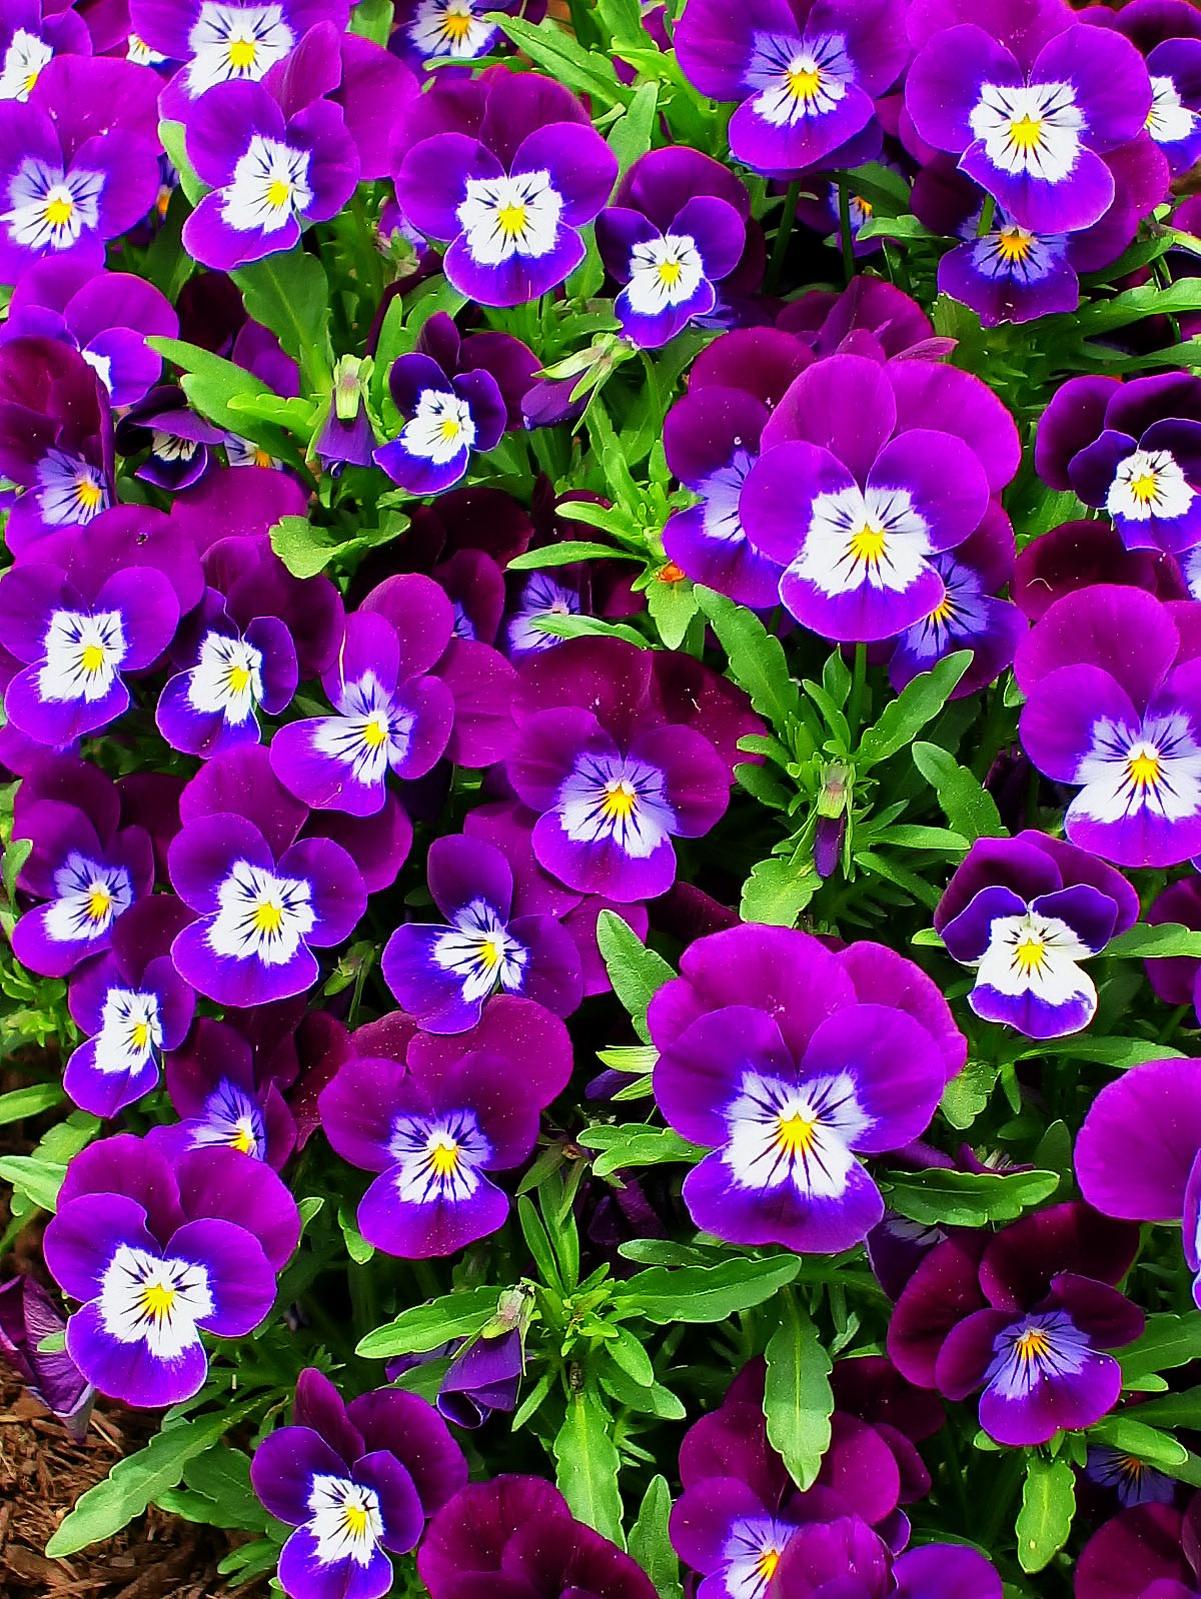 pennsylvania, quakertown, purple, pansies, spring,, photo